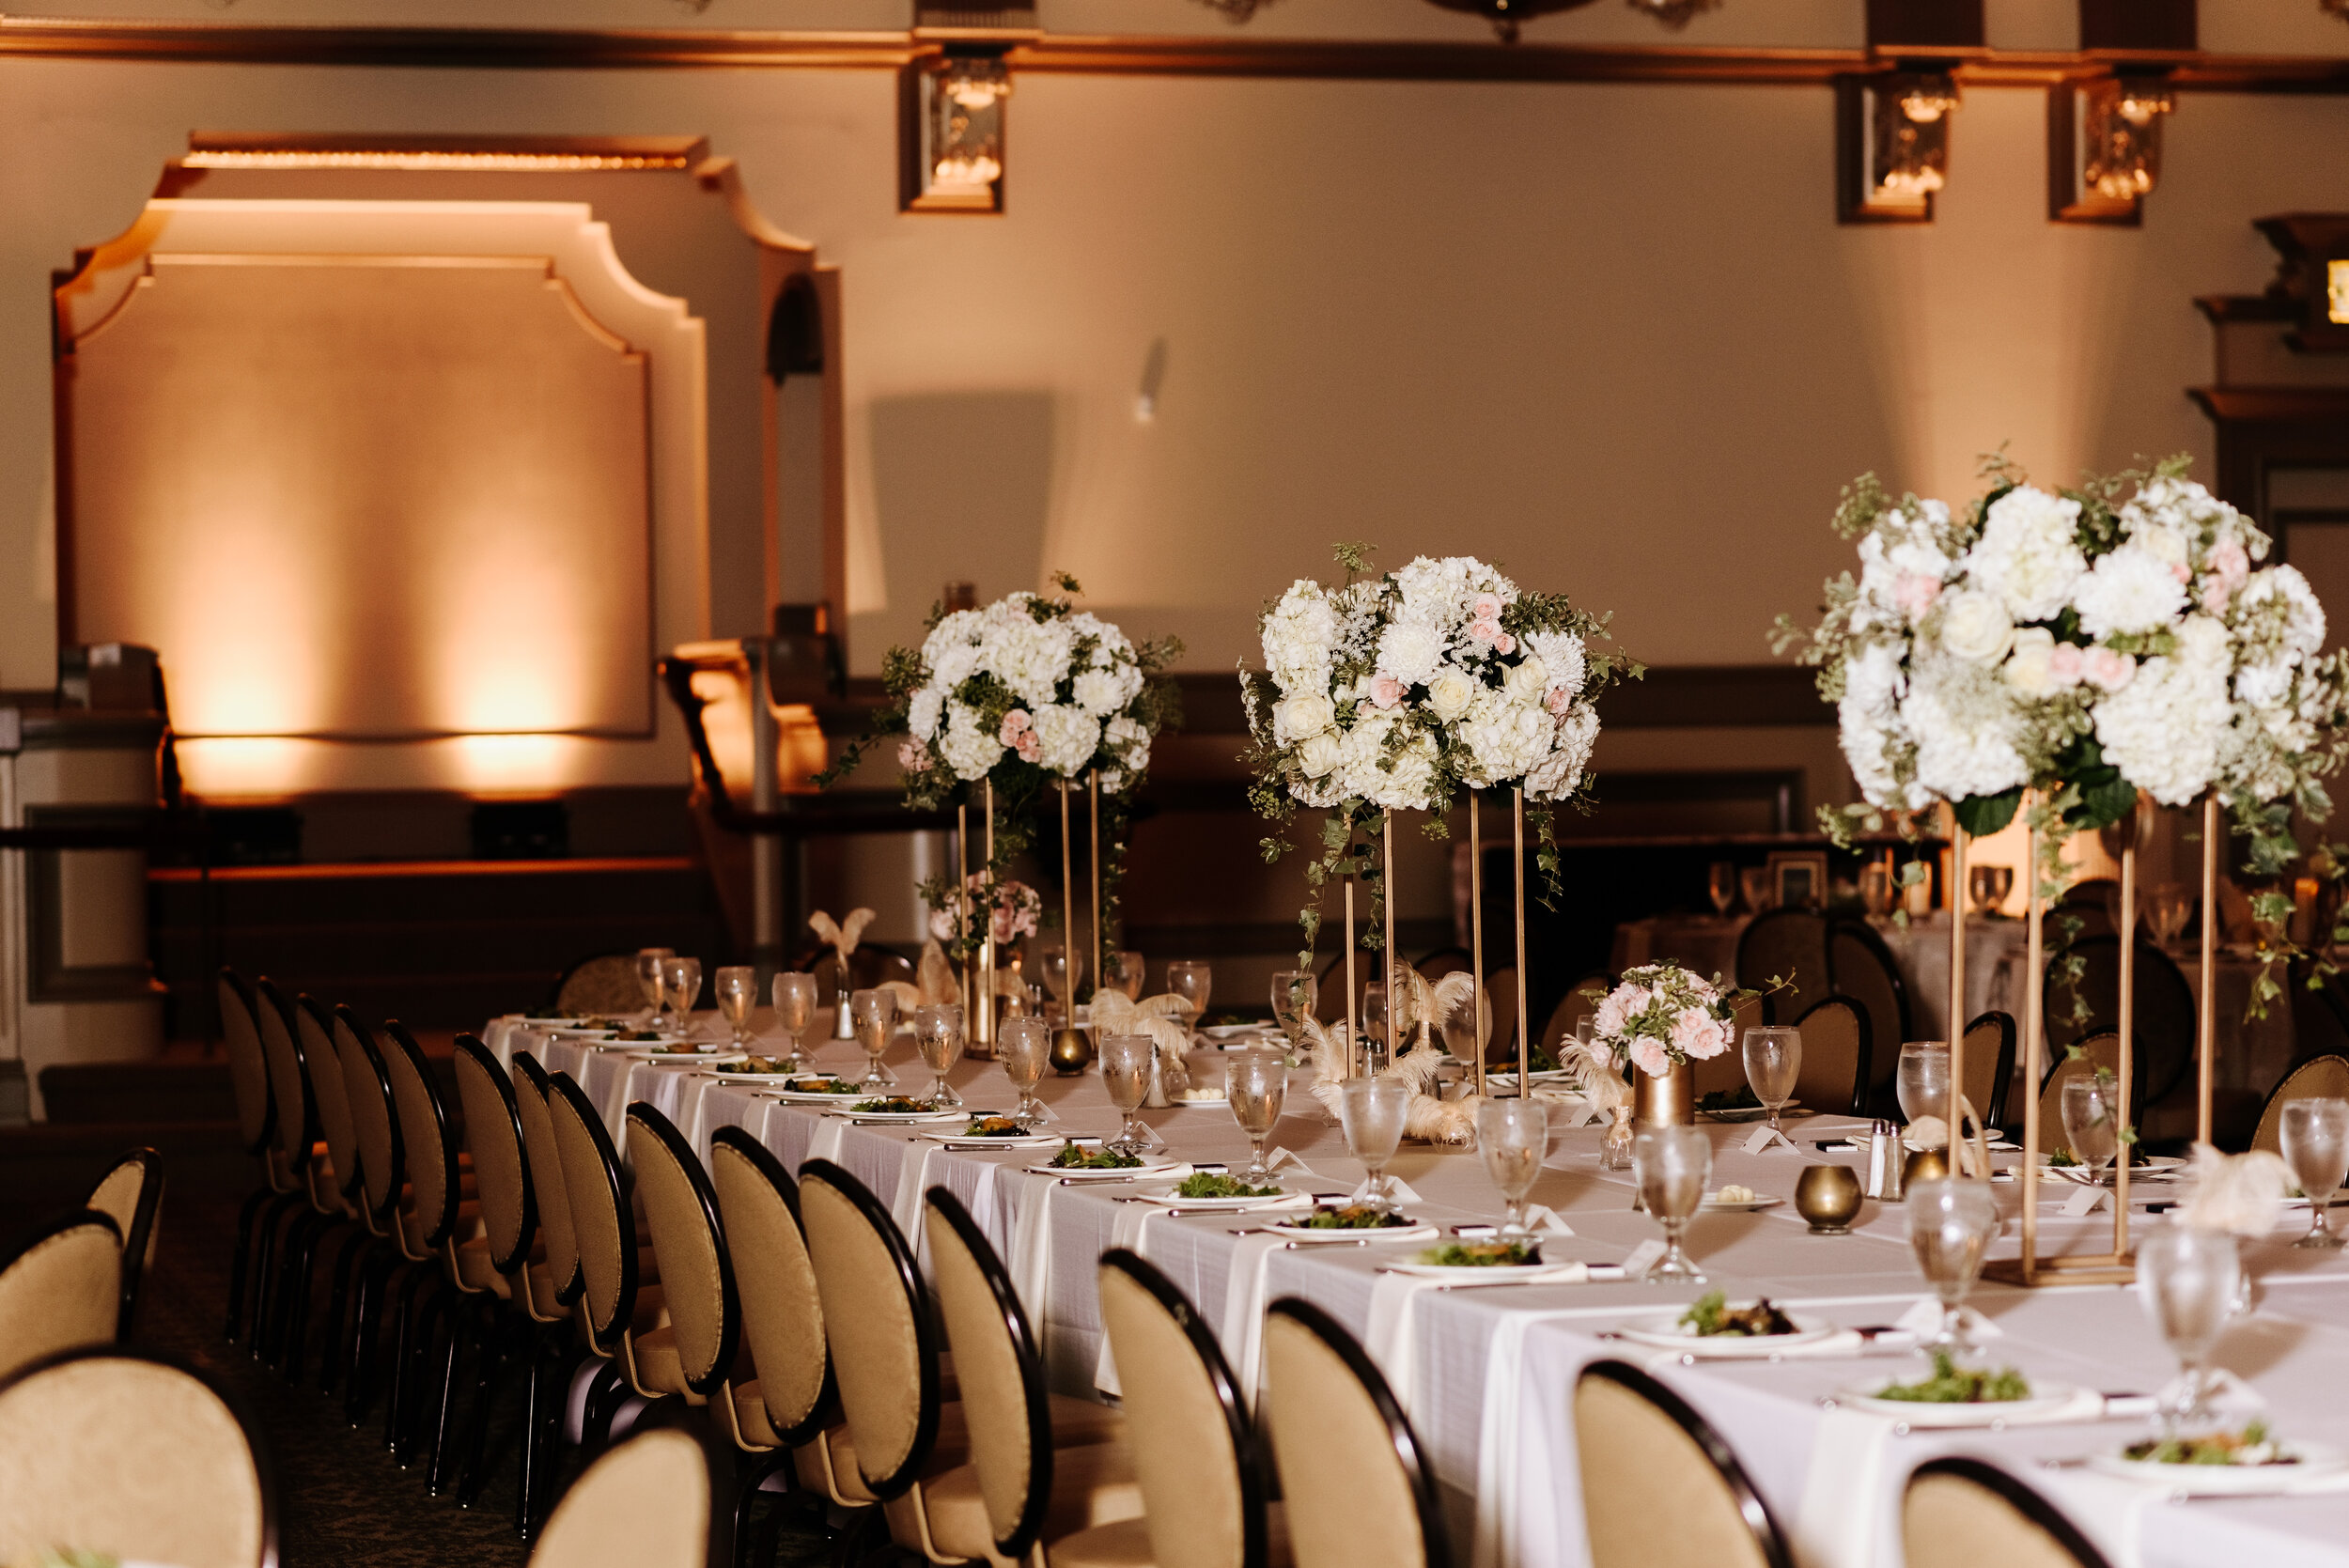 Cassie-Mrunal-Wedding-Quirk-Hotel-John-Marshall-Ballrooms-Richmond-Virginia-Photography-by-V-85.jpg